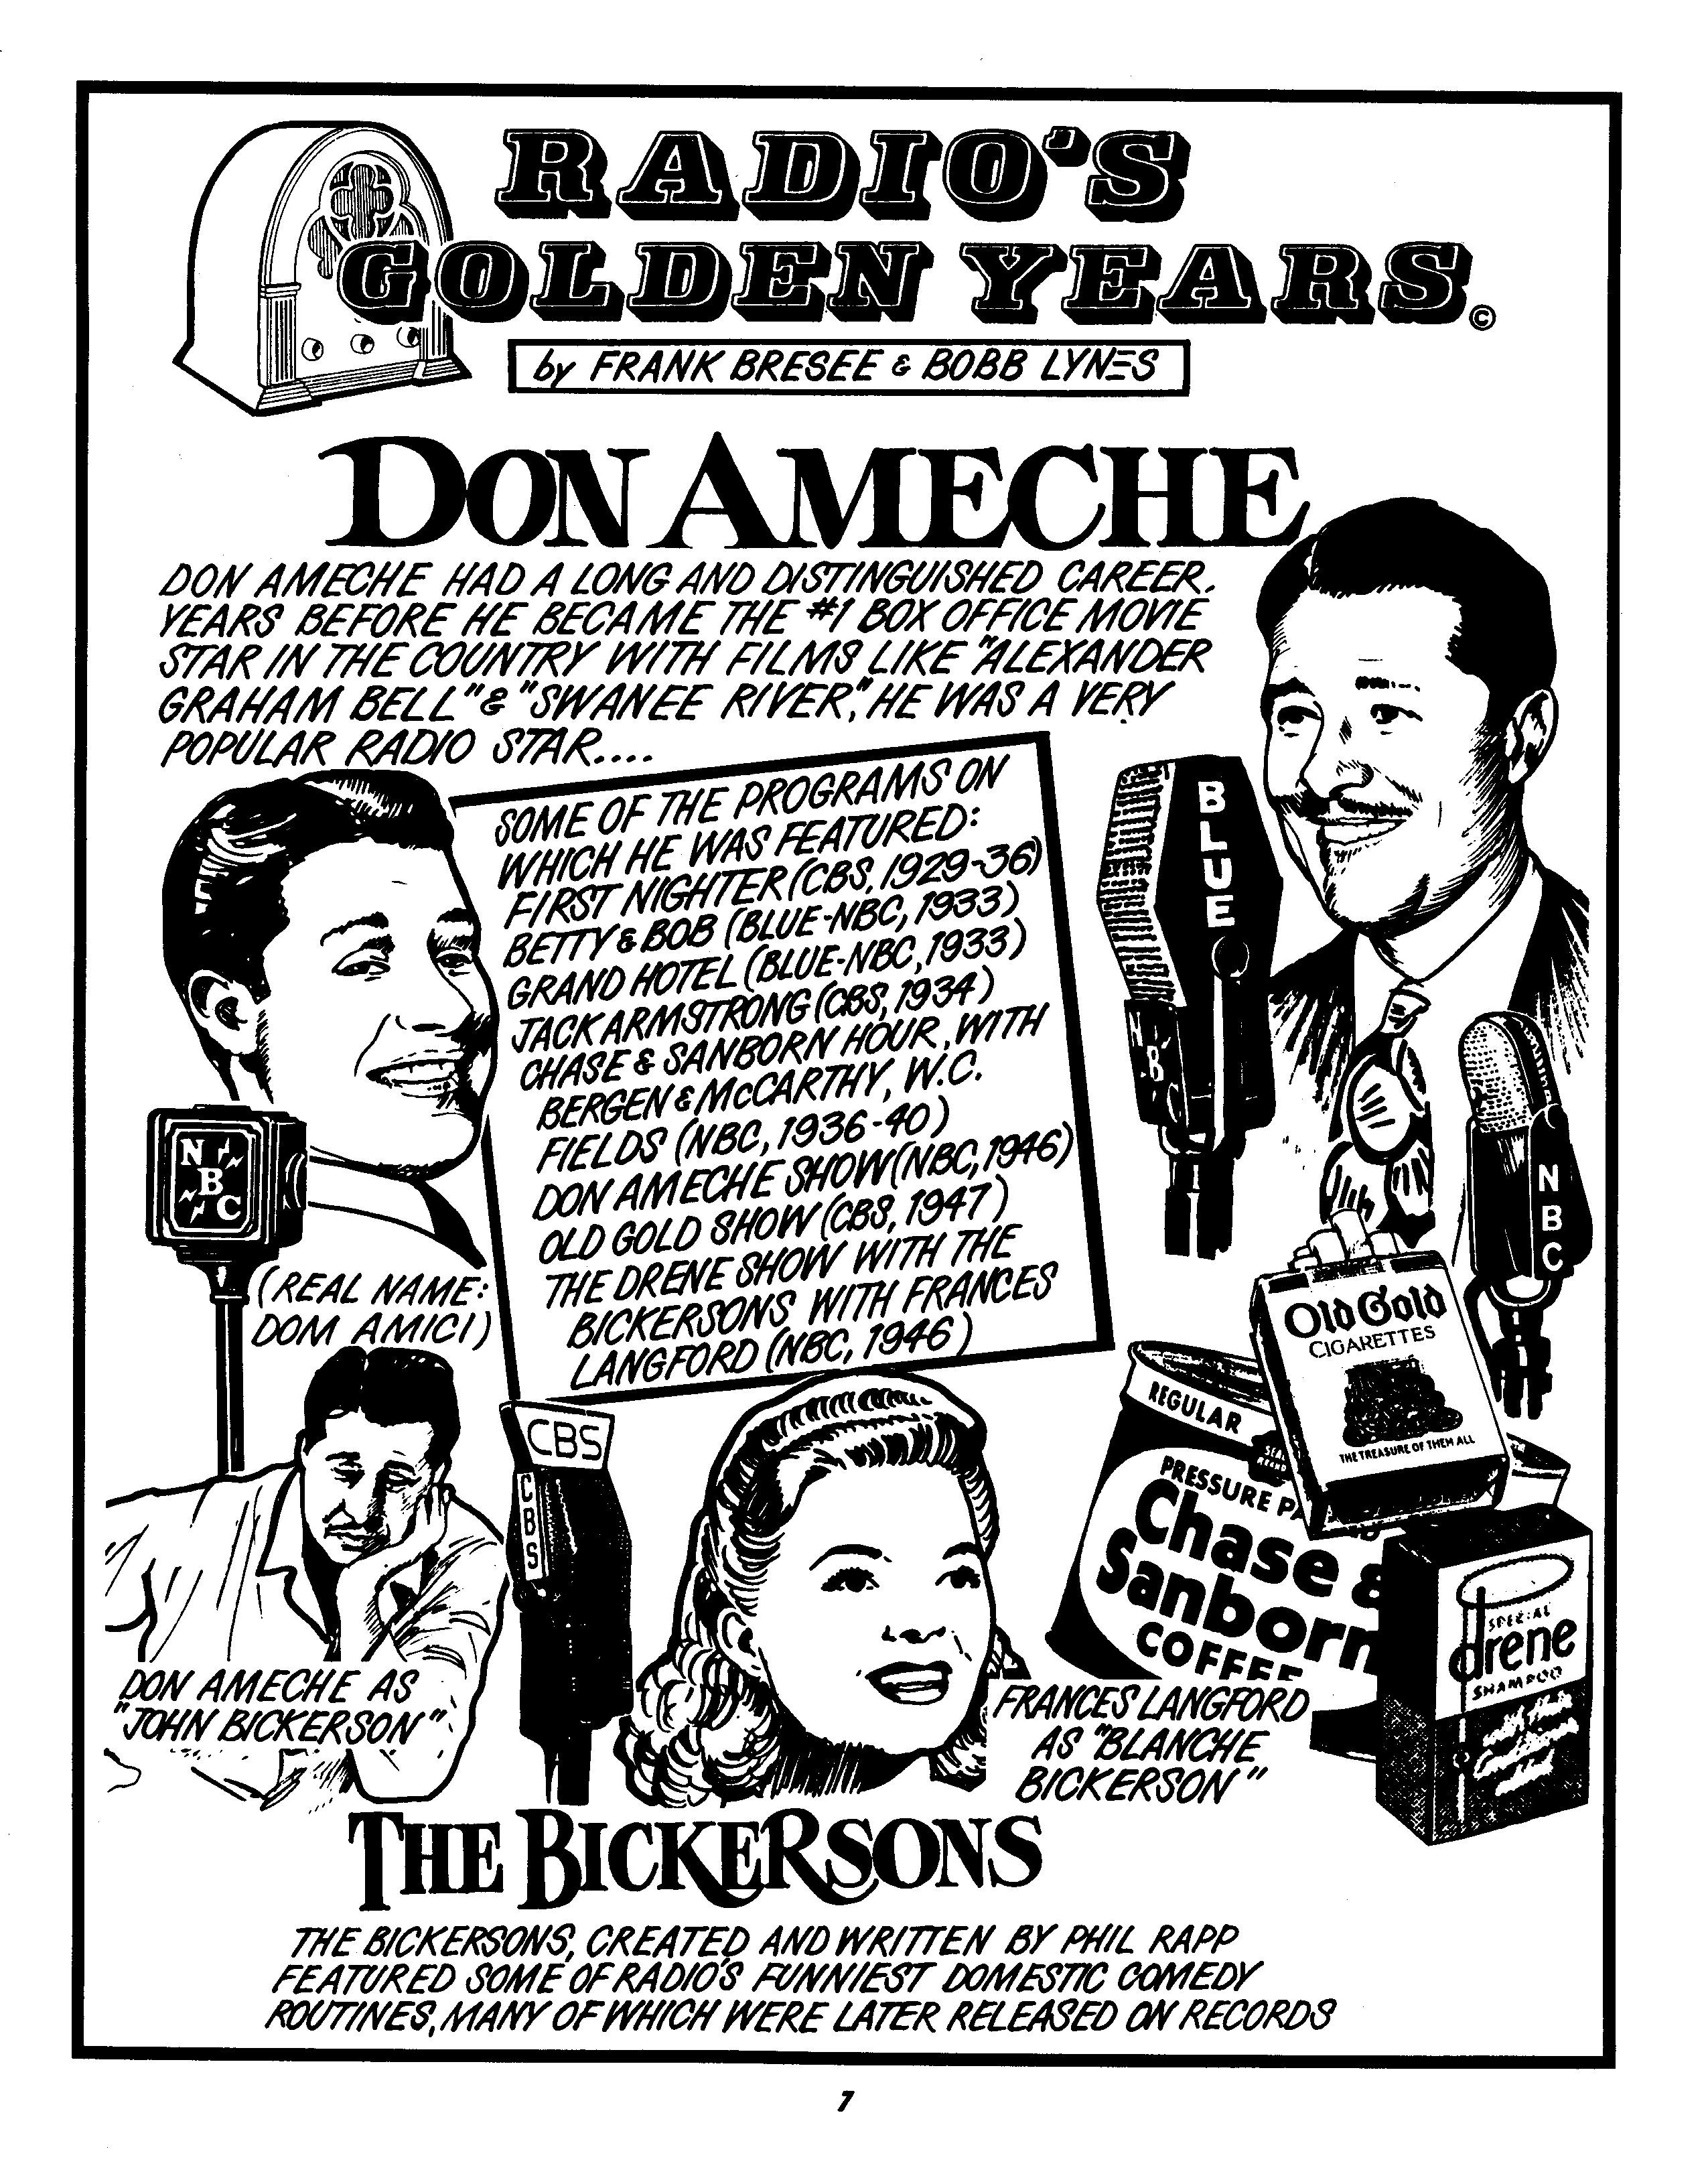 Don Ameche Show